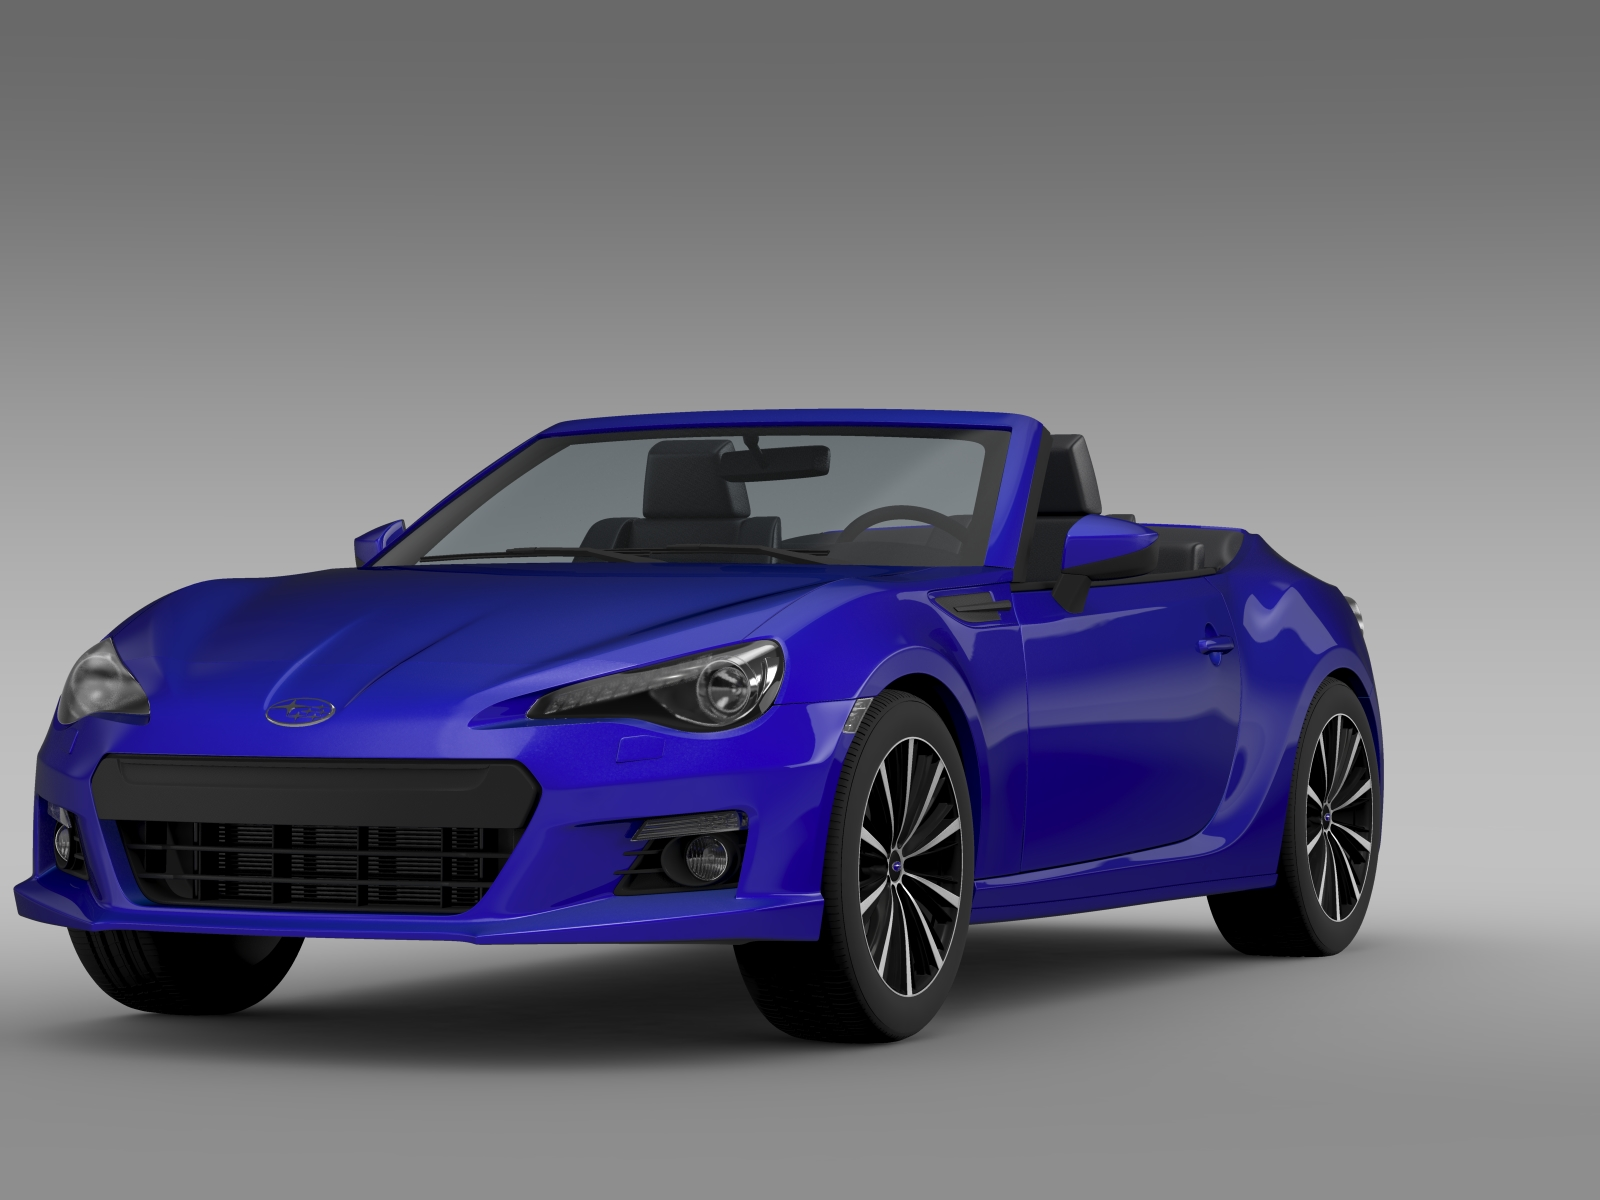 subaru brz zc6 cabrio 2015 3d model. Black Bedroom Furniture Sets. Home Design Ideas